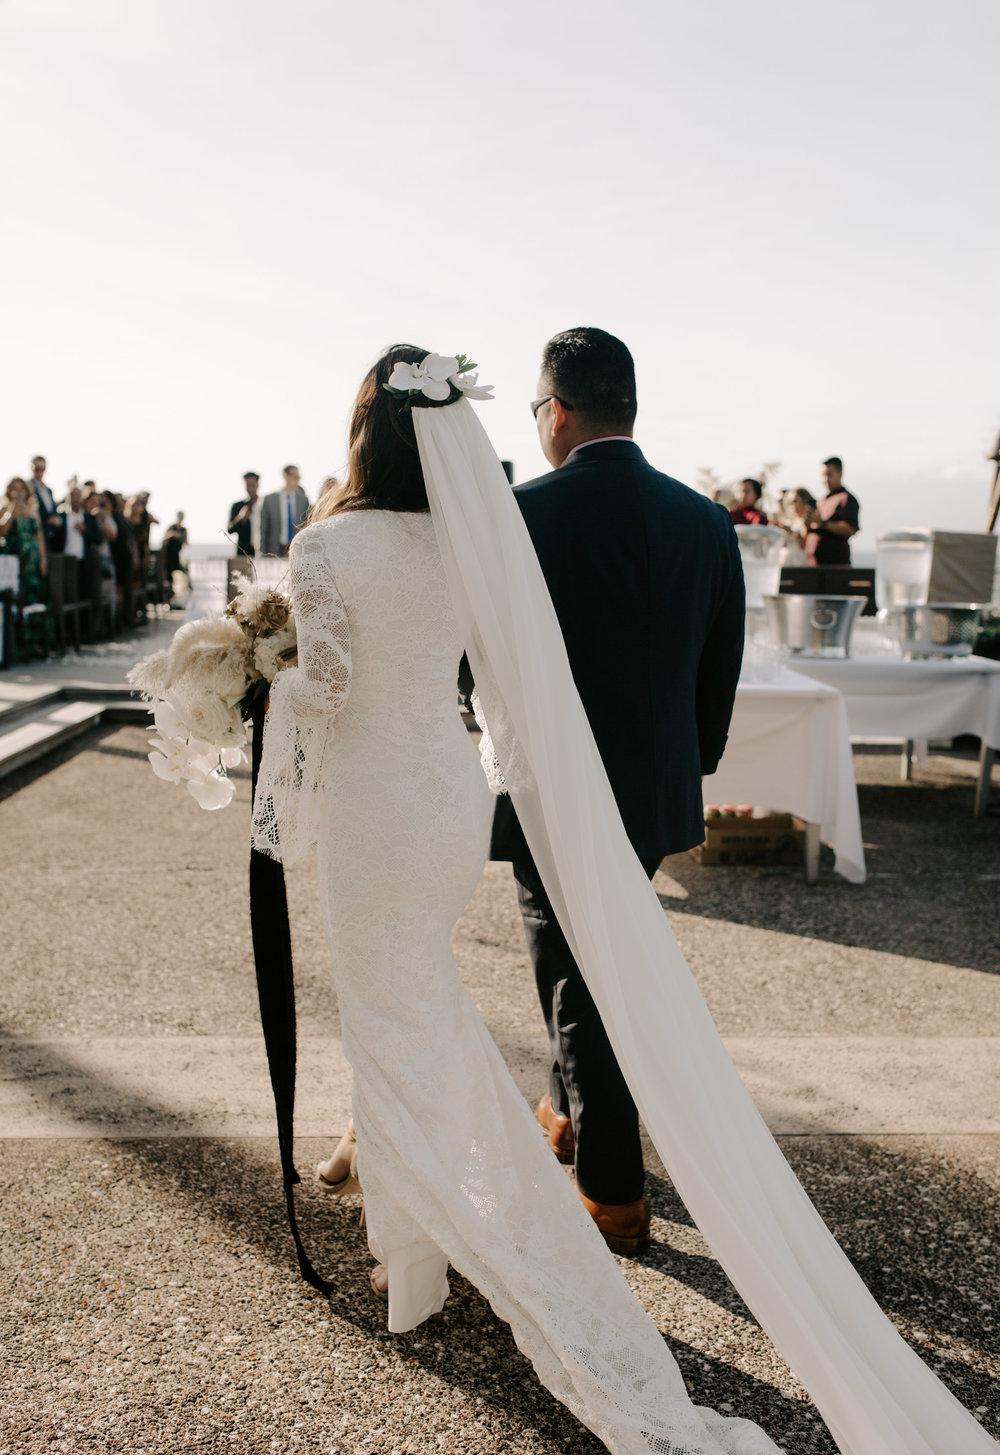 Father walking bride down the aisle | Merriman's Kapalua Maui wedding by Hawaii wedding photographer Desiree Leilani